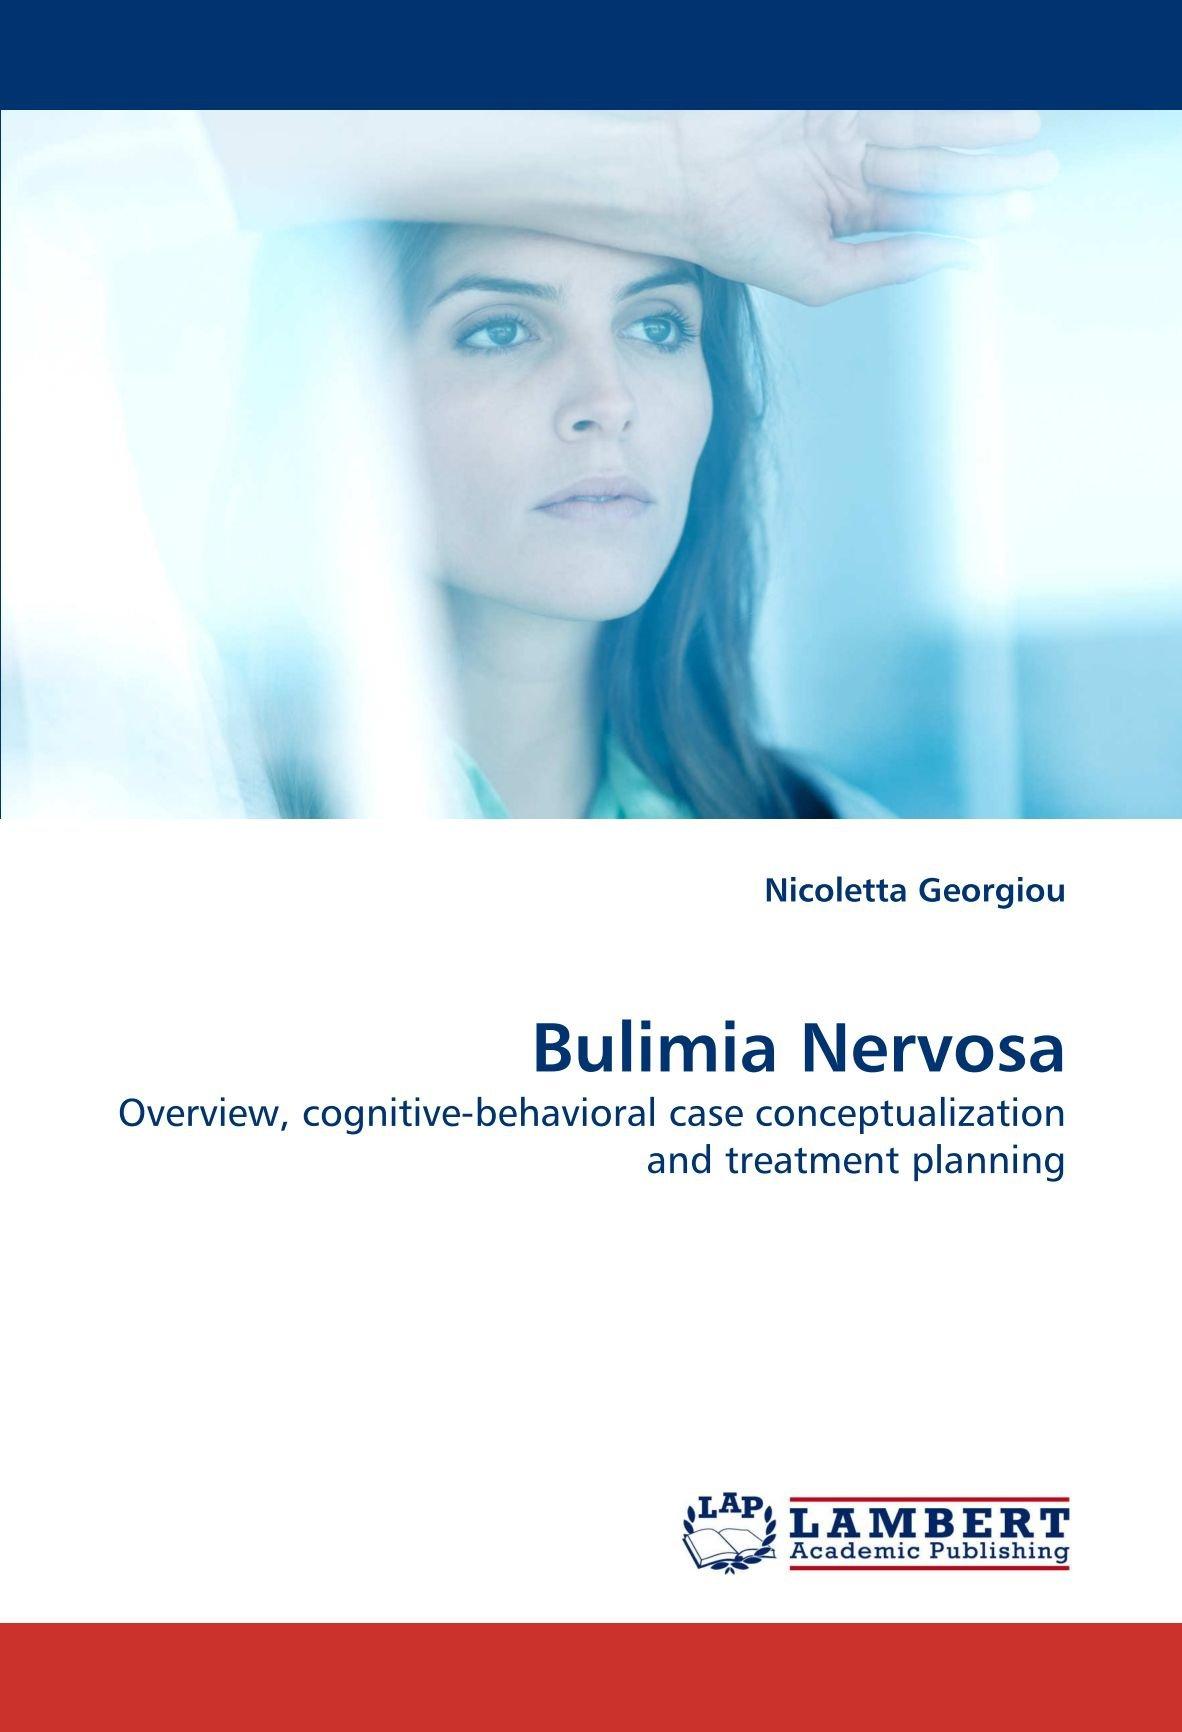 Bulimia Nervosa: Overview, cognitive-behavioral case conceptualization and treatment planning ebook